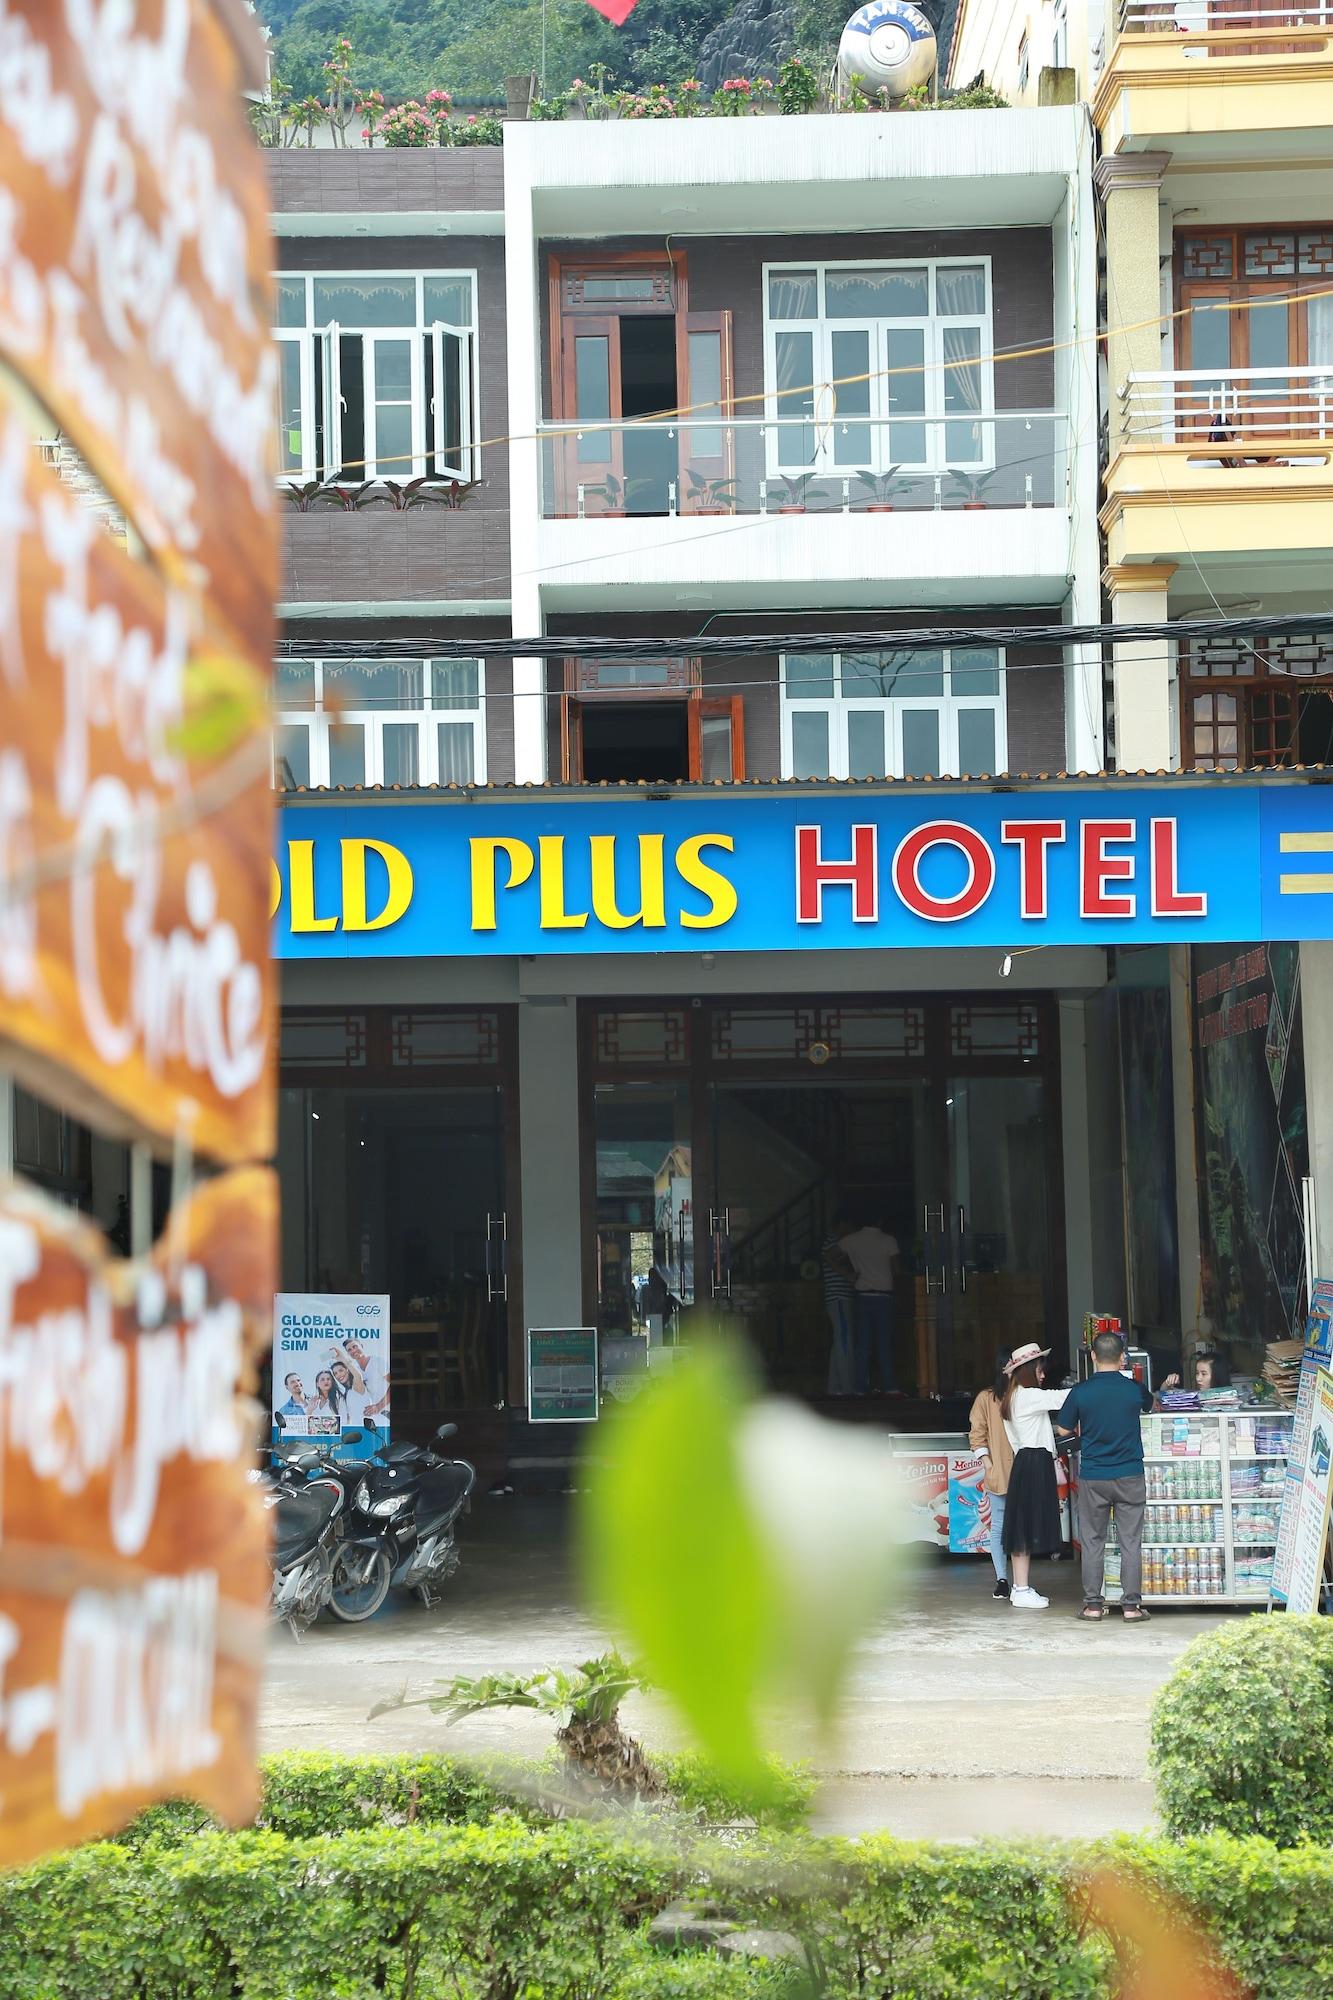 Gold Plus Hotel, Bố Trạch